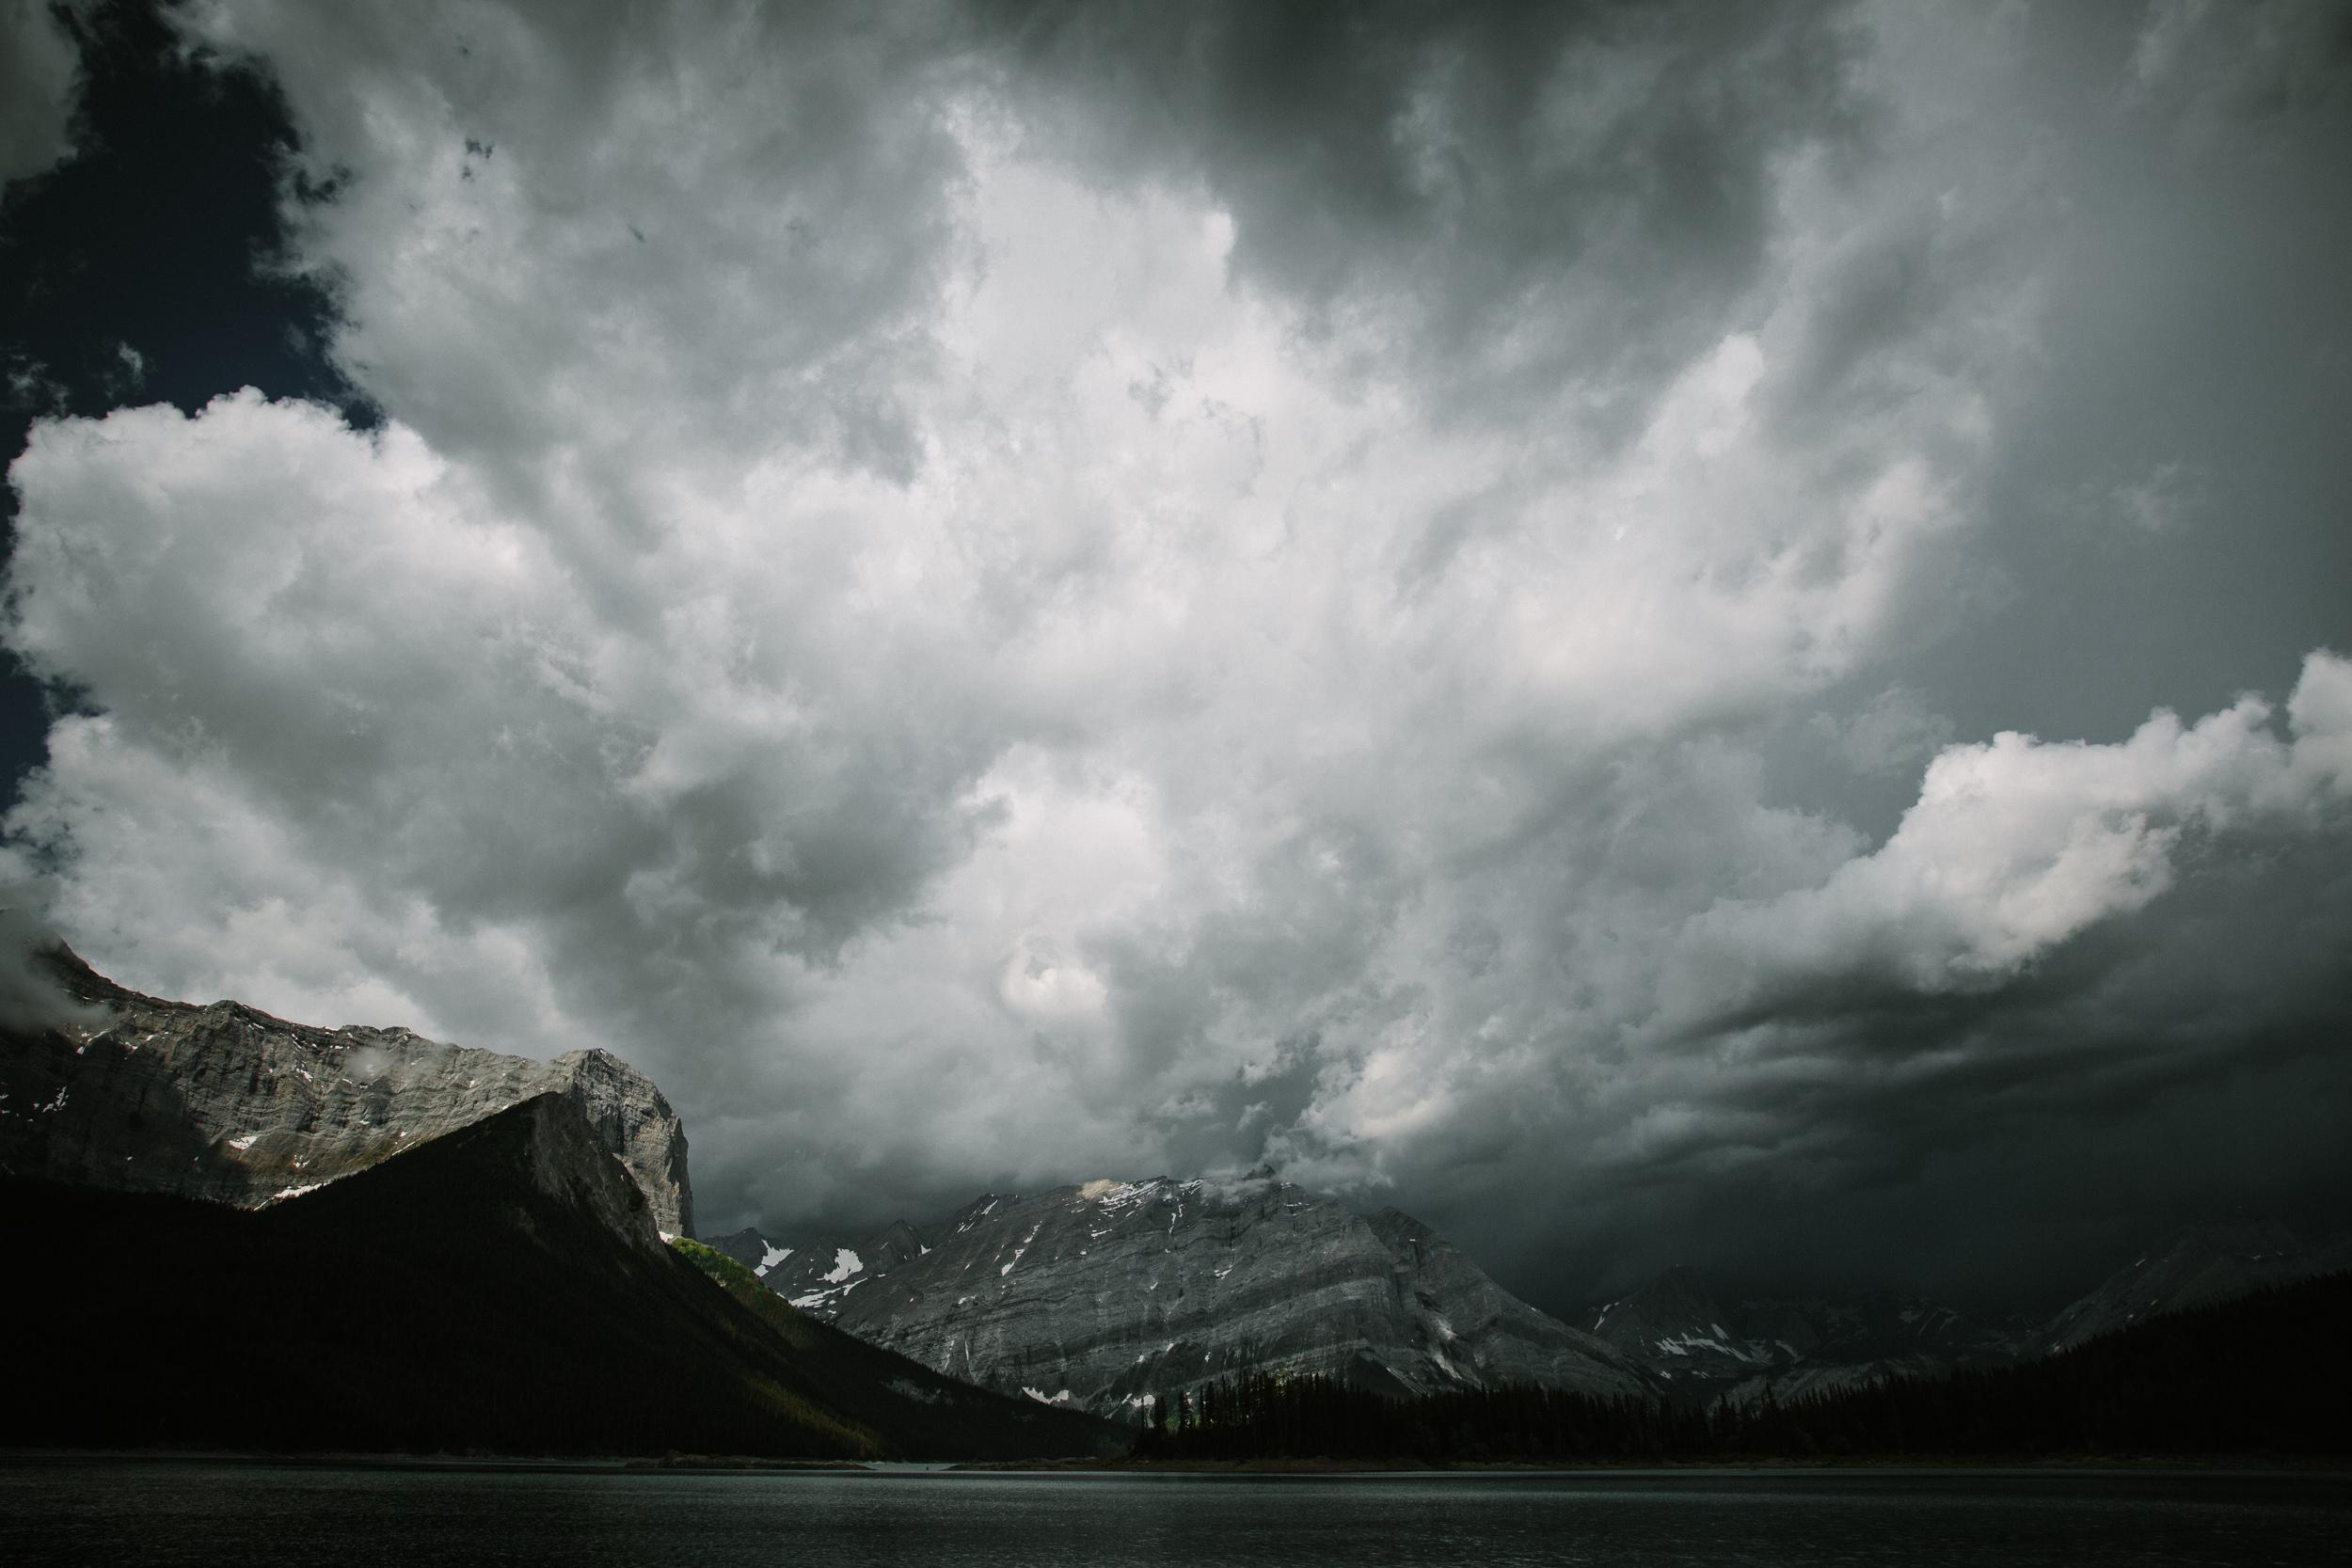 steve_seeley-kananaskis_lake_storm.jpg